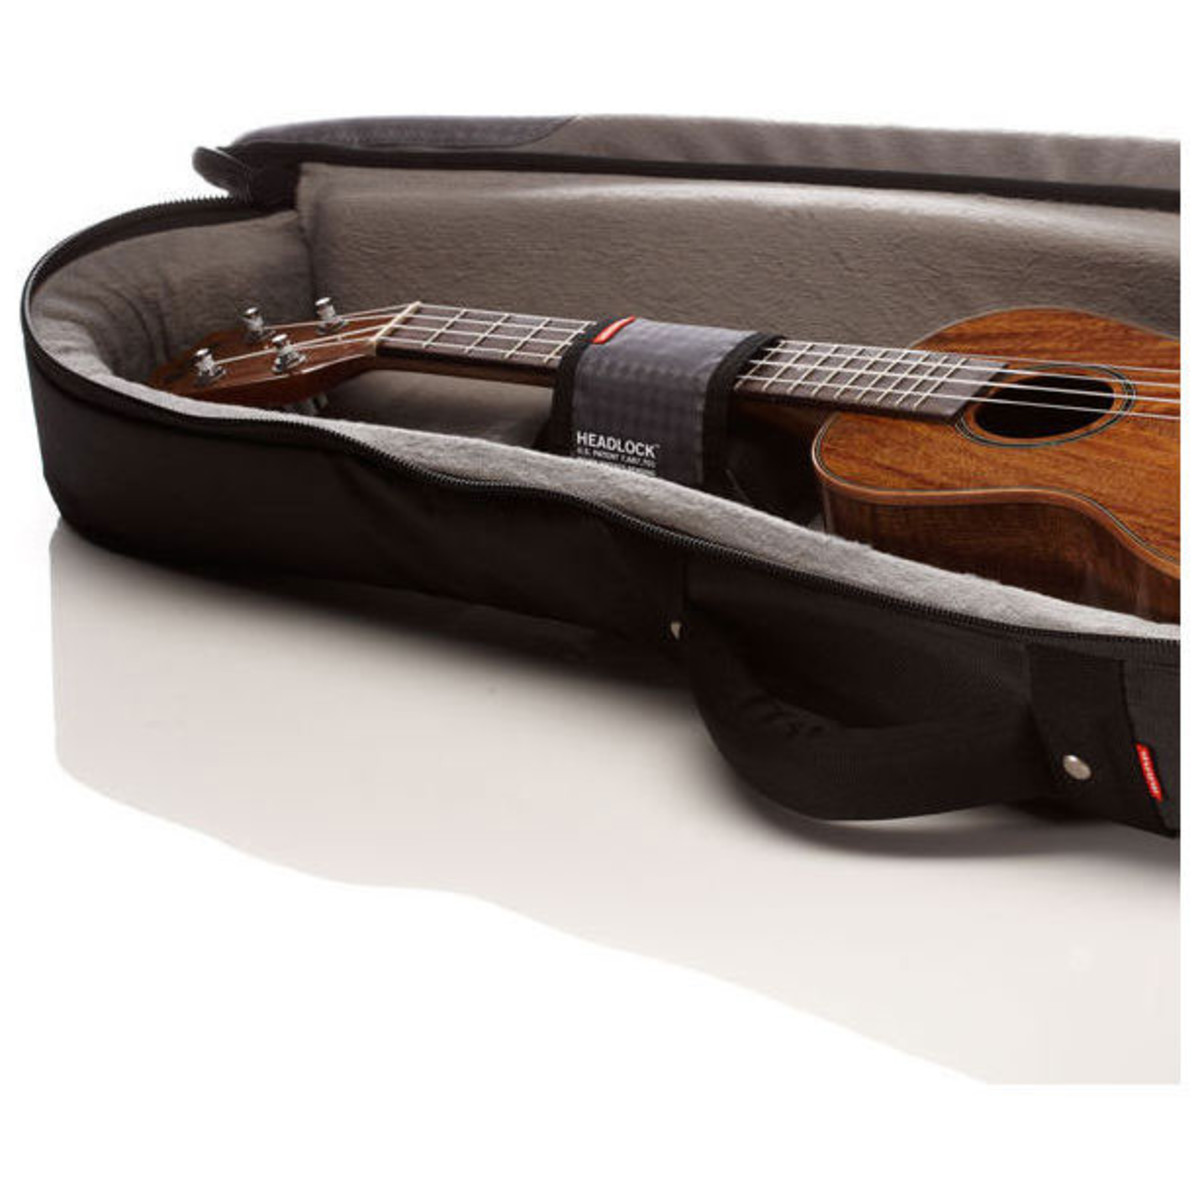 Mono m80 housse ukul l concert noir for Housse ukulele concert